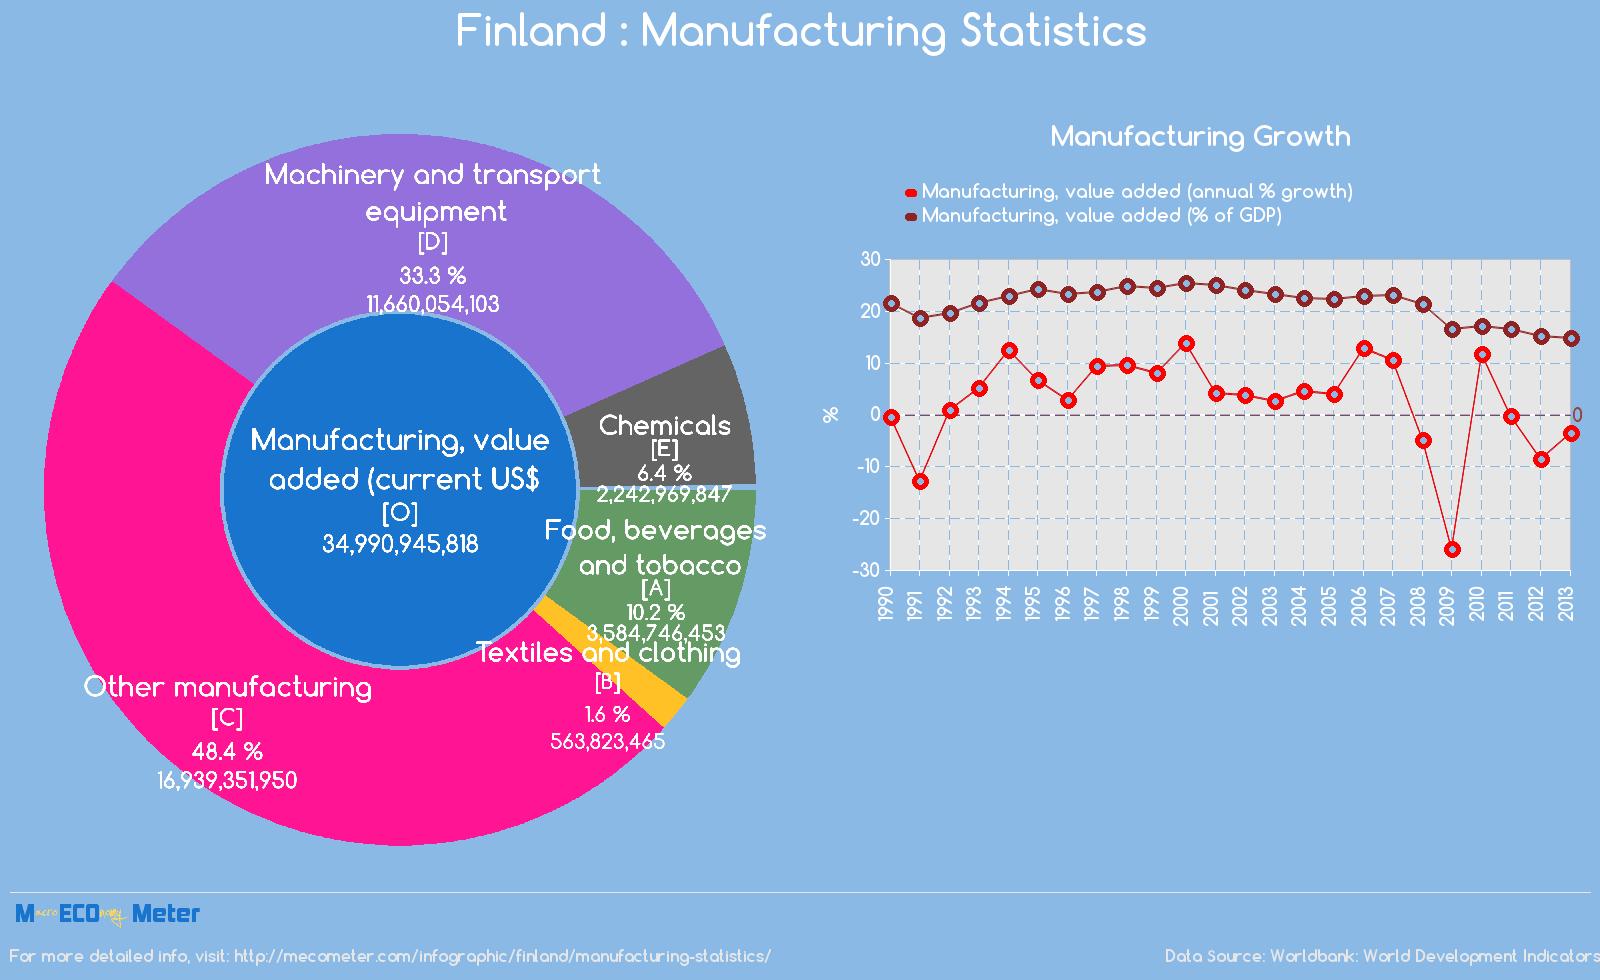 Finland : Manufacturing Statistics